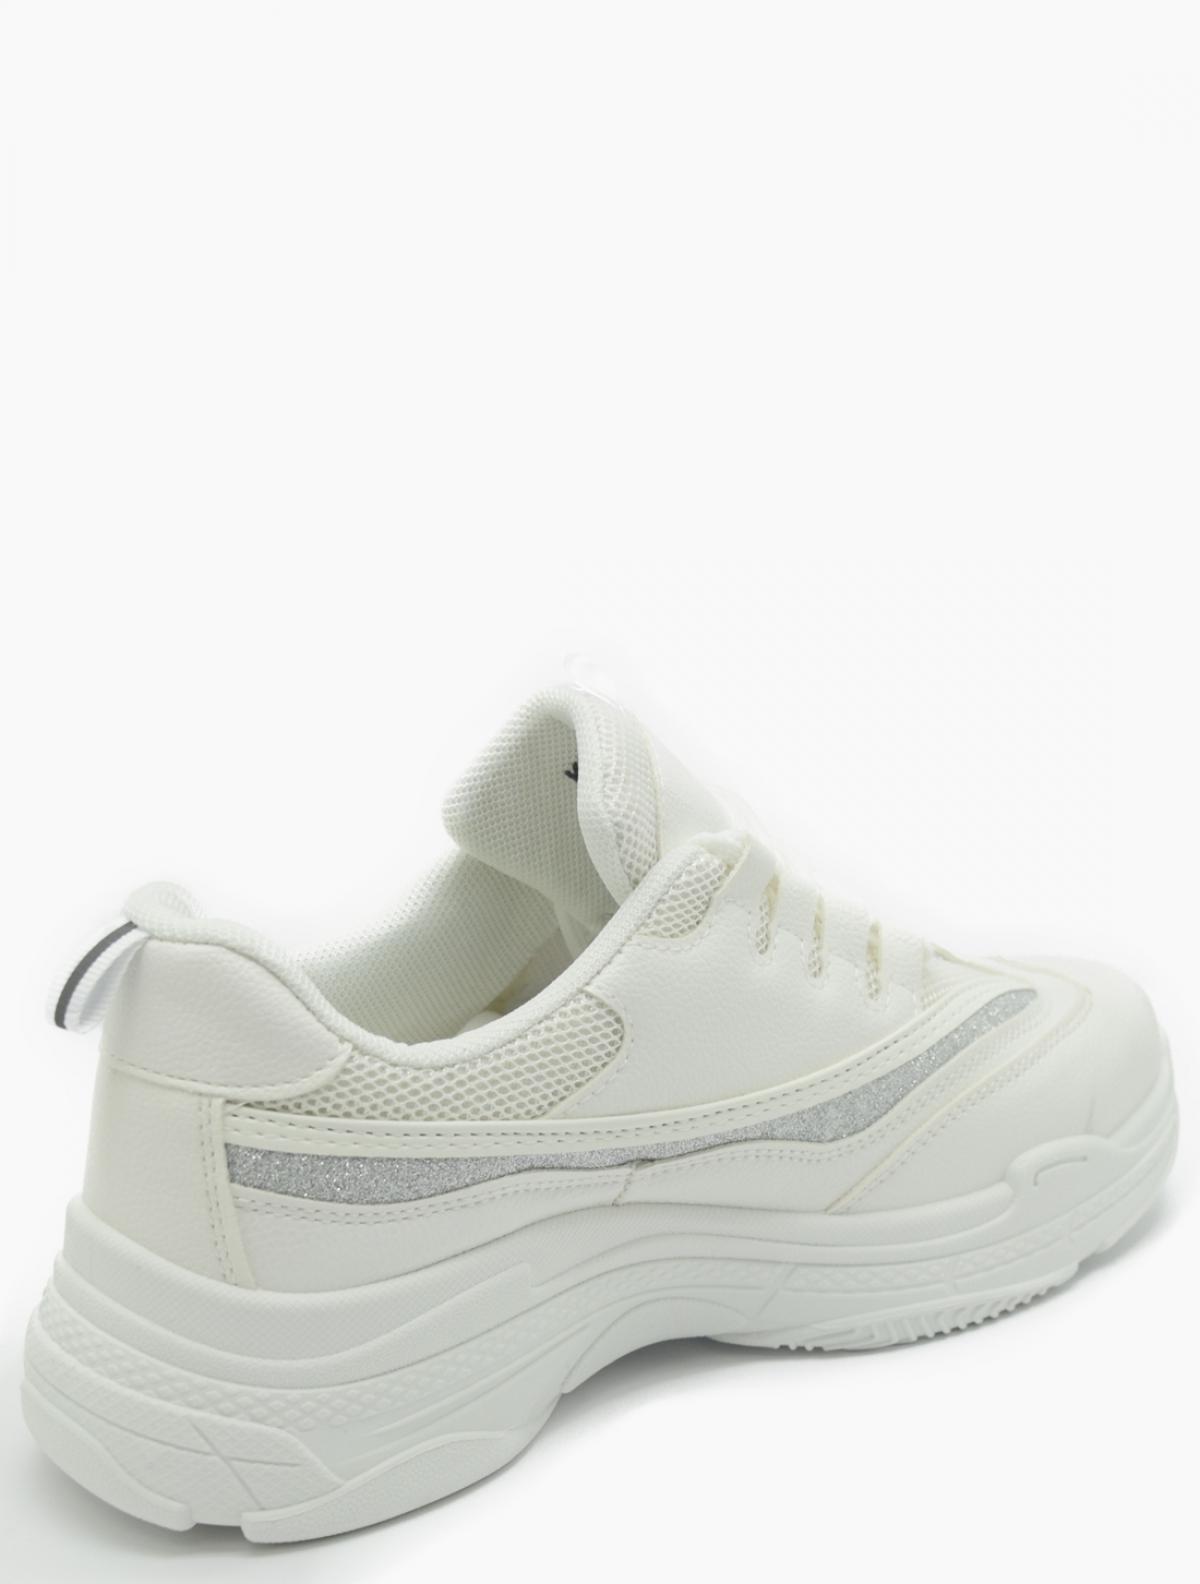 Rio Fiore KM101A женские кроссовки